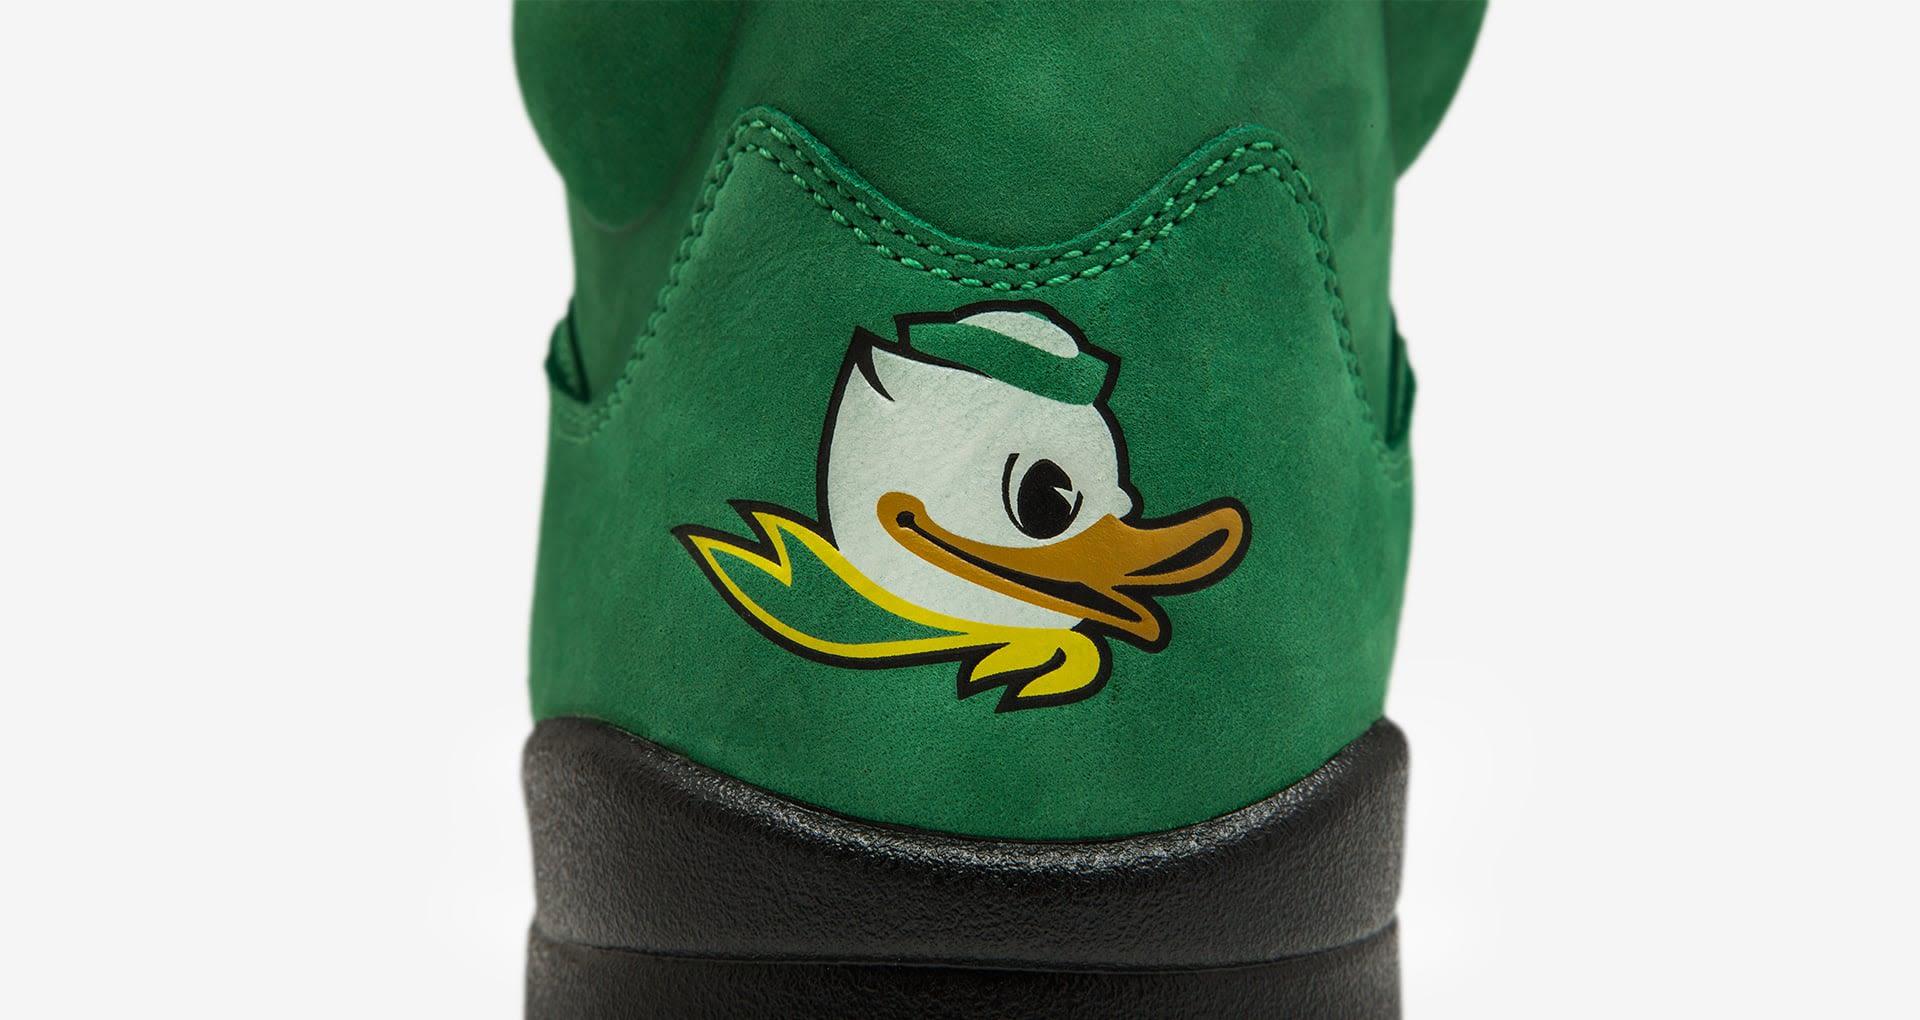 a3608607aaf0 Inside the Vault  Oregon Ducks x Jordan Brand. Nike+ SNKRS